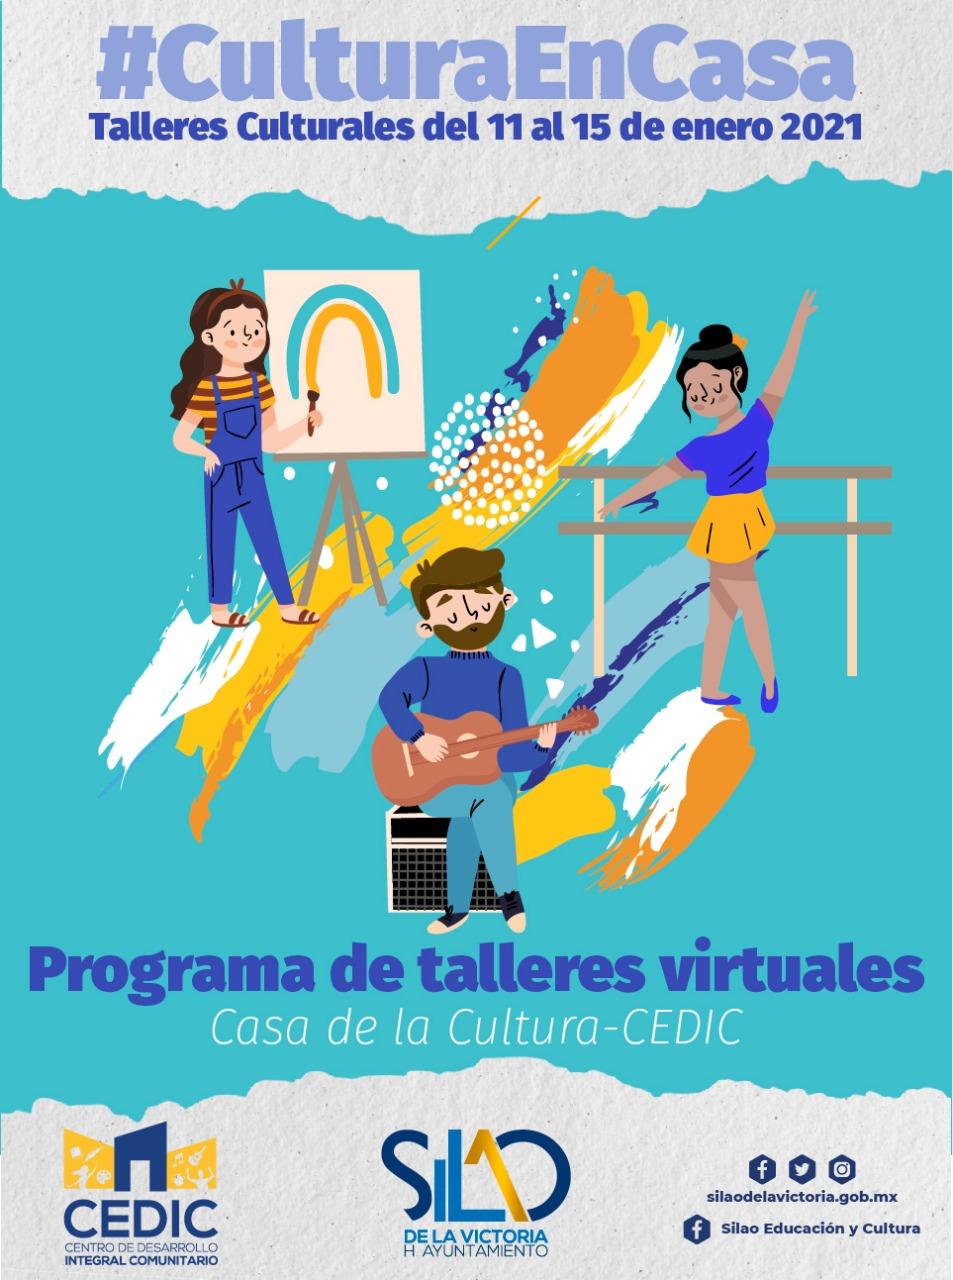 Invitan a seguir programa de talleres culturales de forma virtual